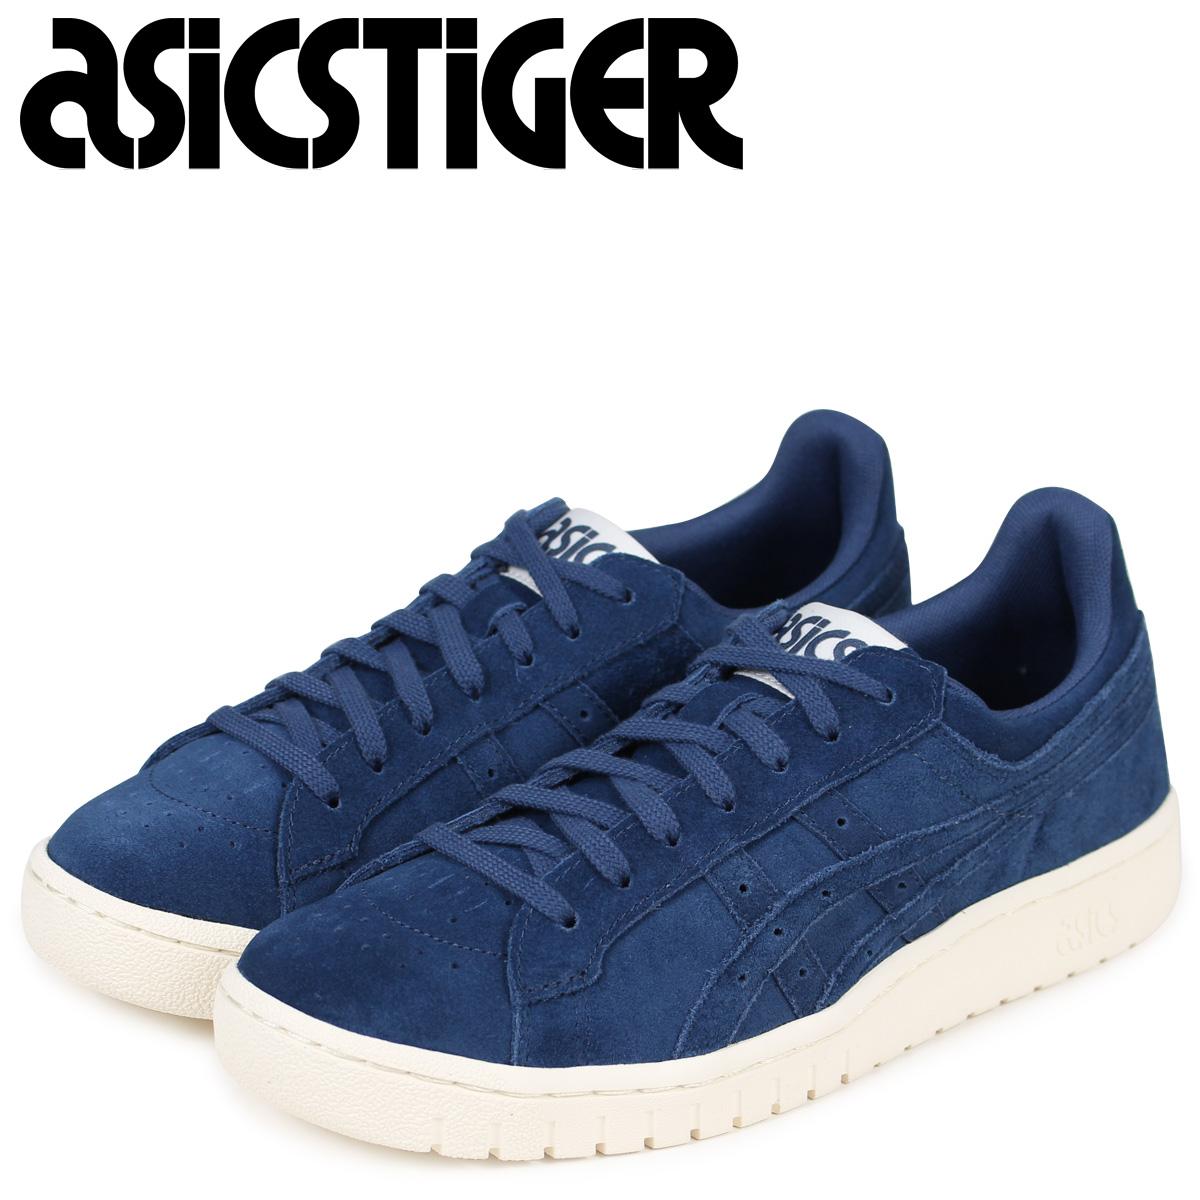 Data wydania buty do biegania klasyczne dopasowanie asics Tiger ASICS tiger gel PTG sneakers GEL point man H8A2L-4949 men blue